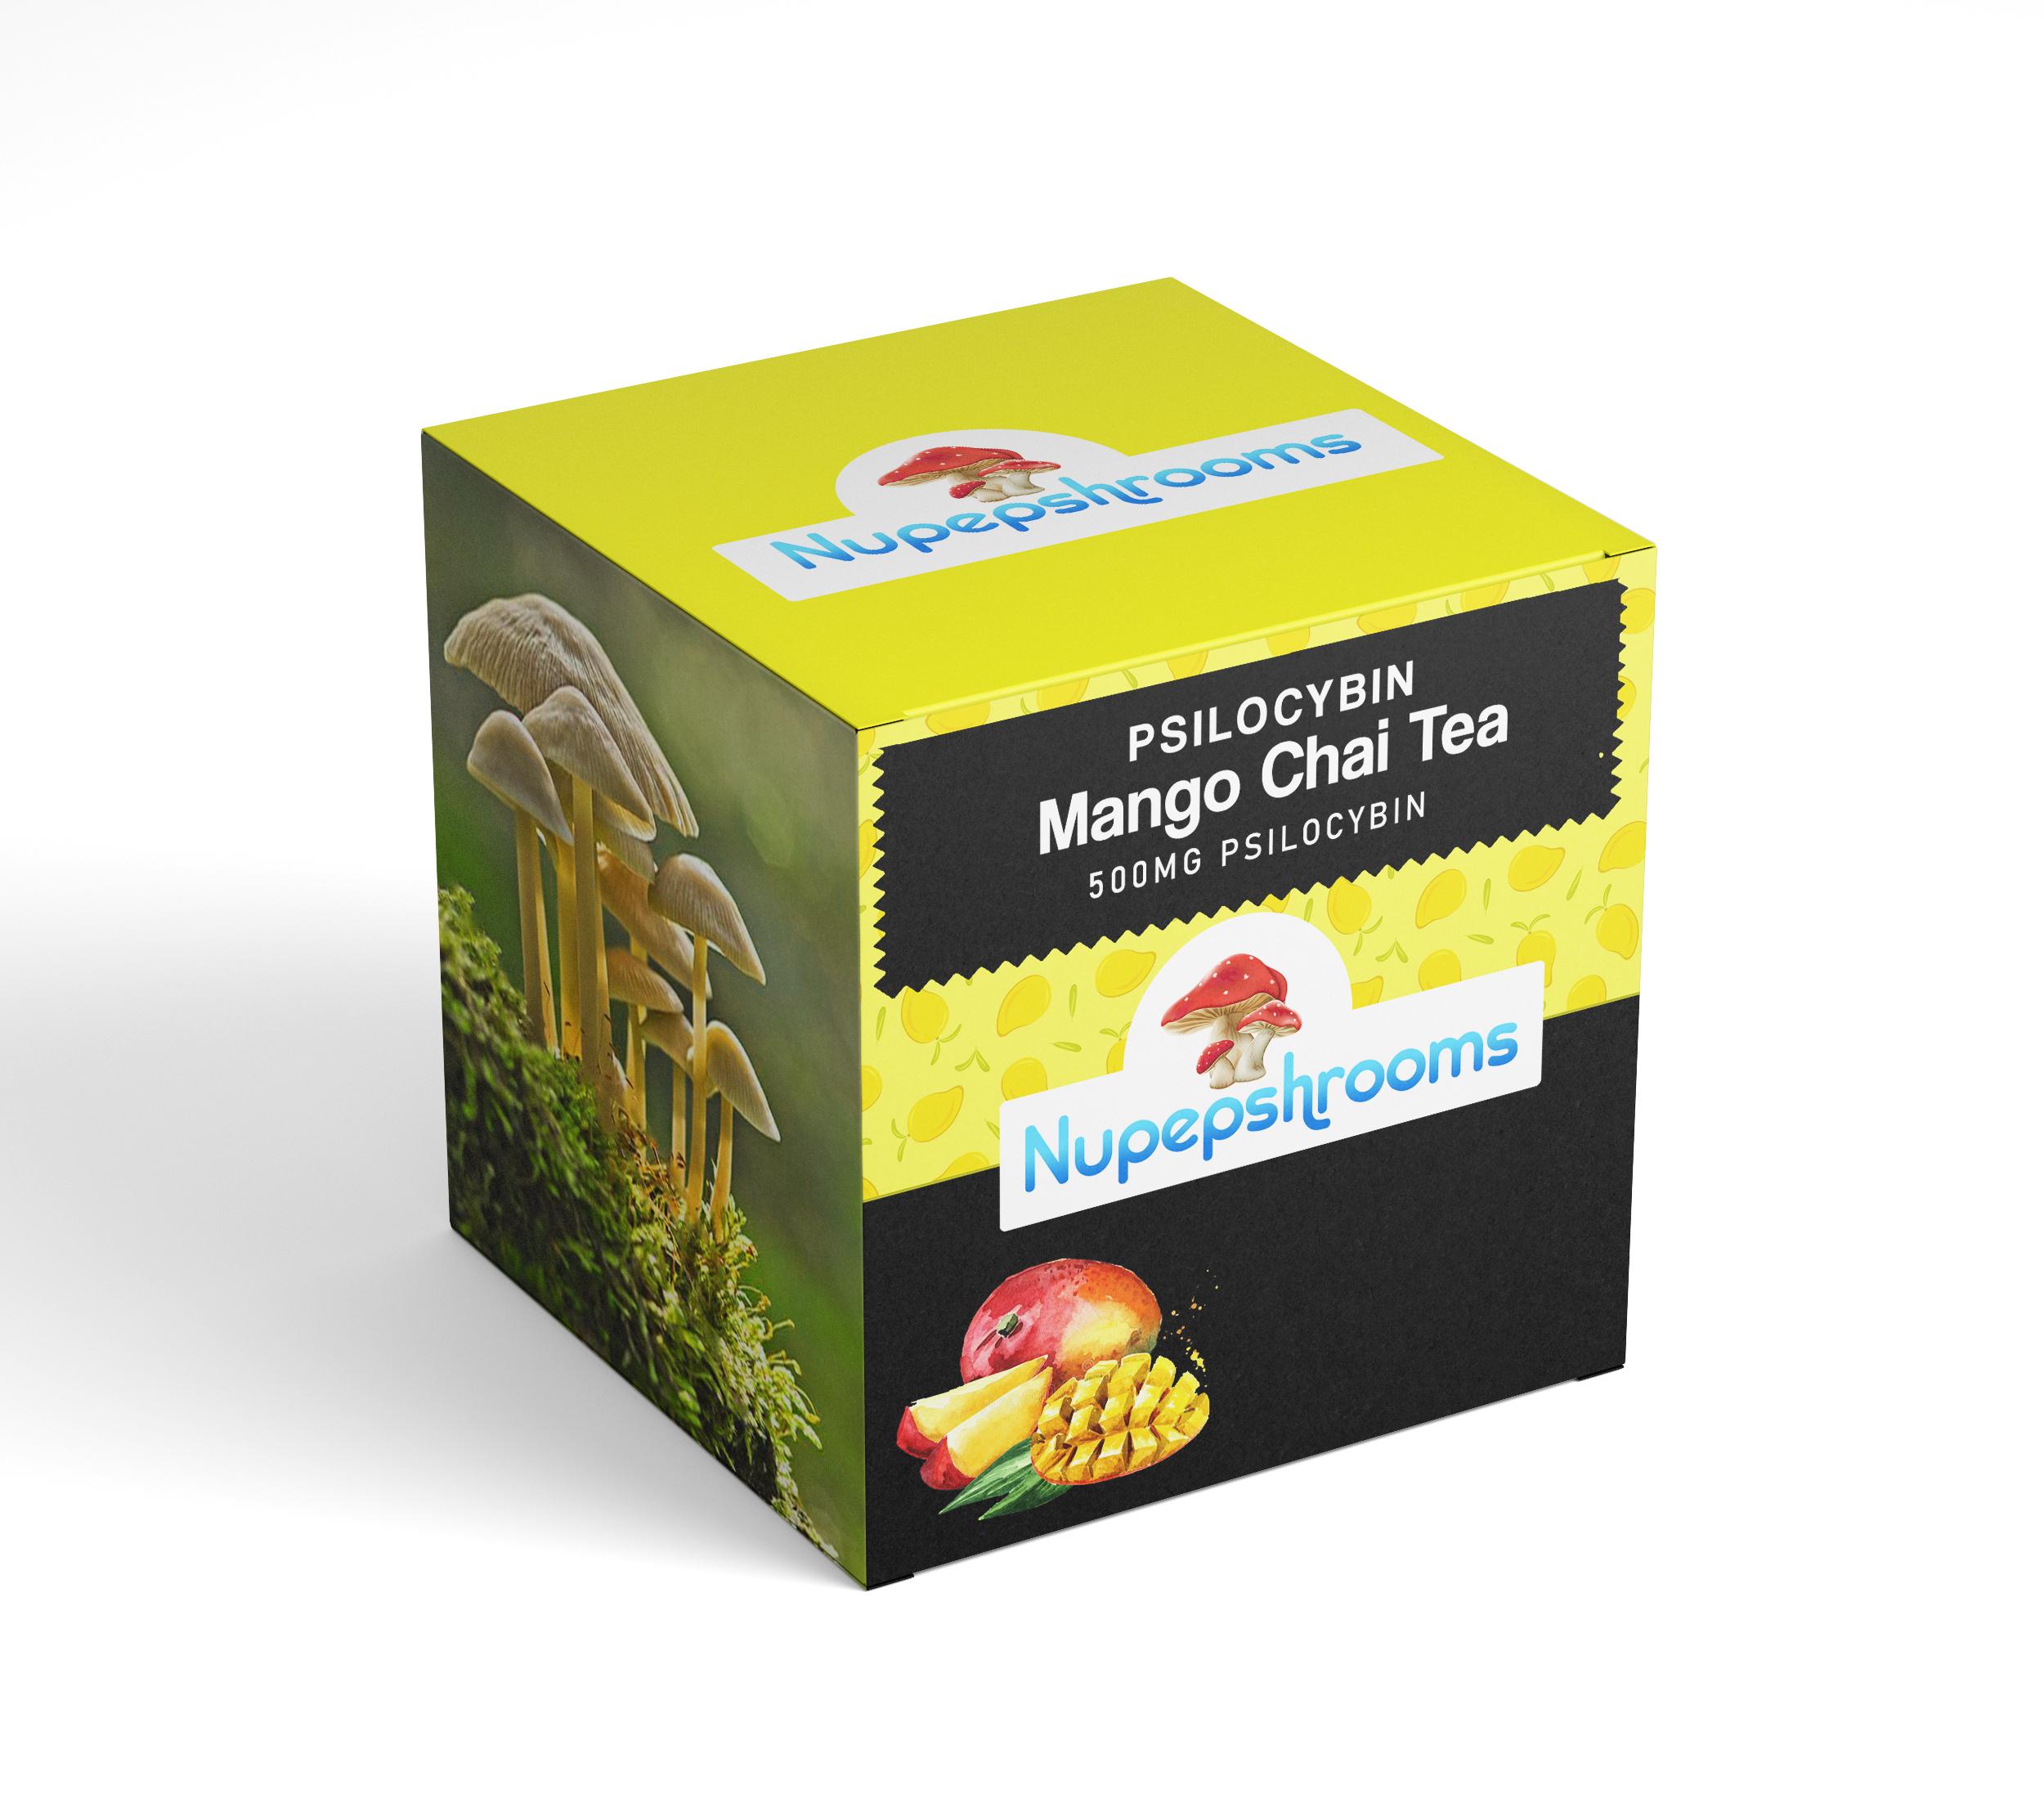 Psilocybin Mango Chai Tea